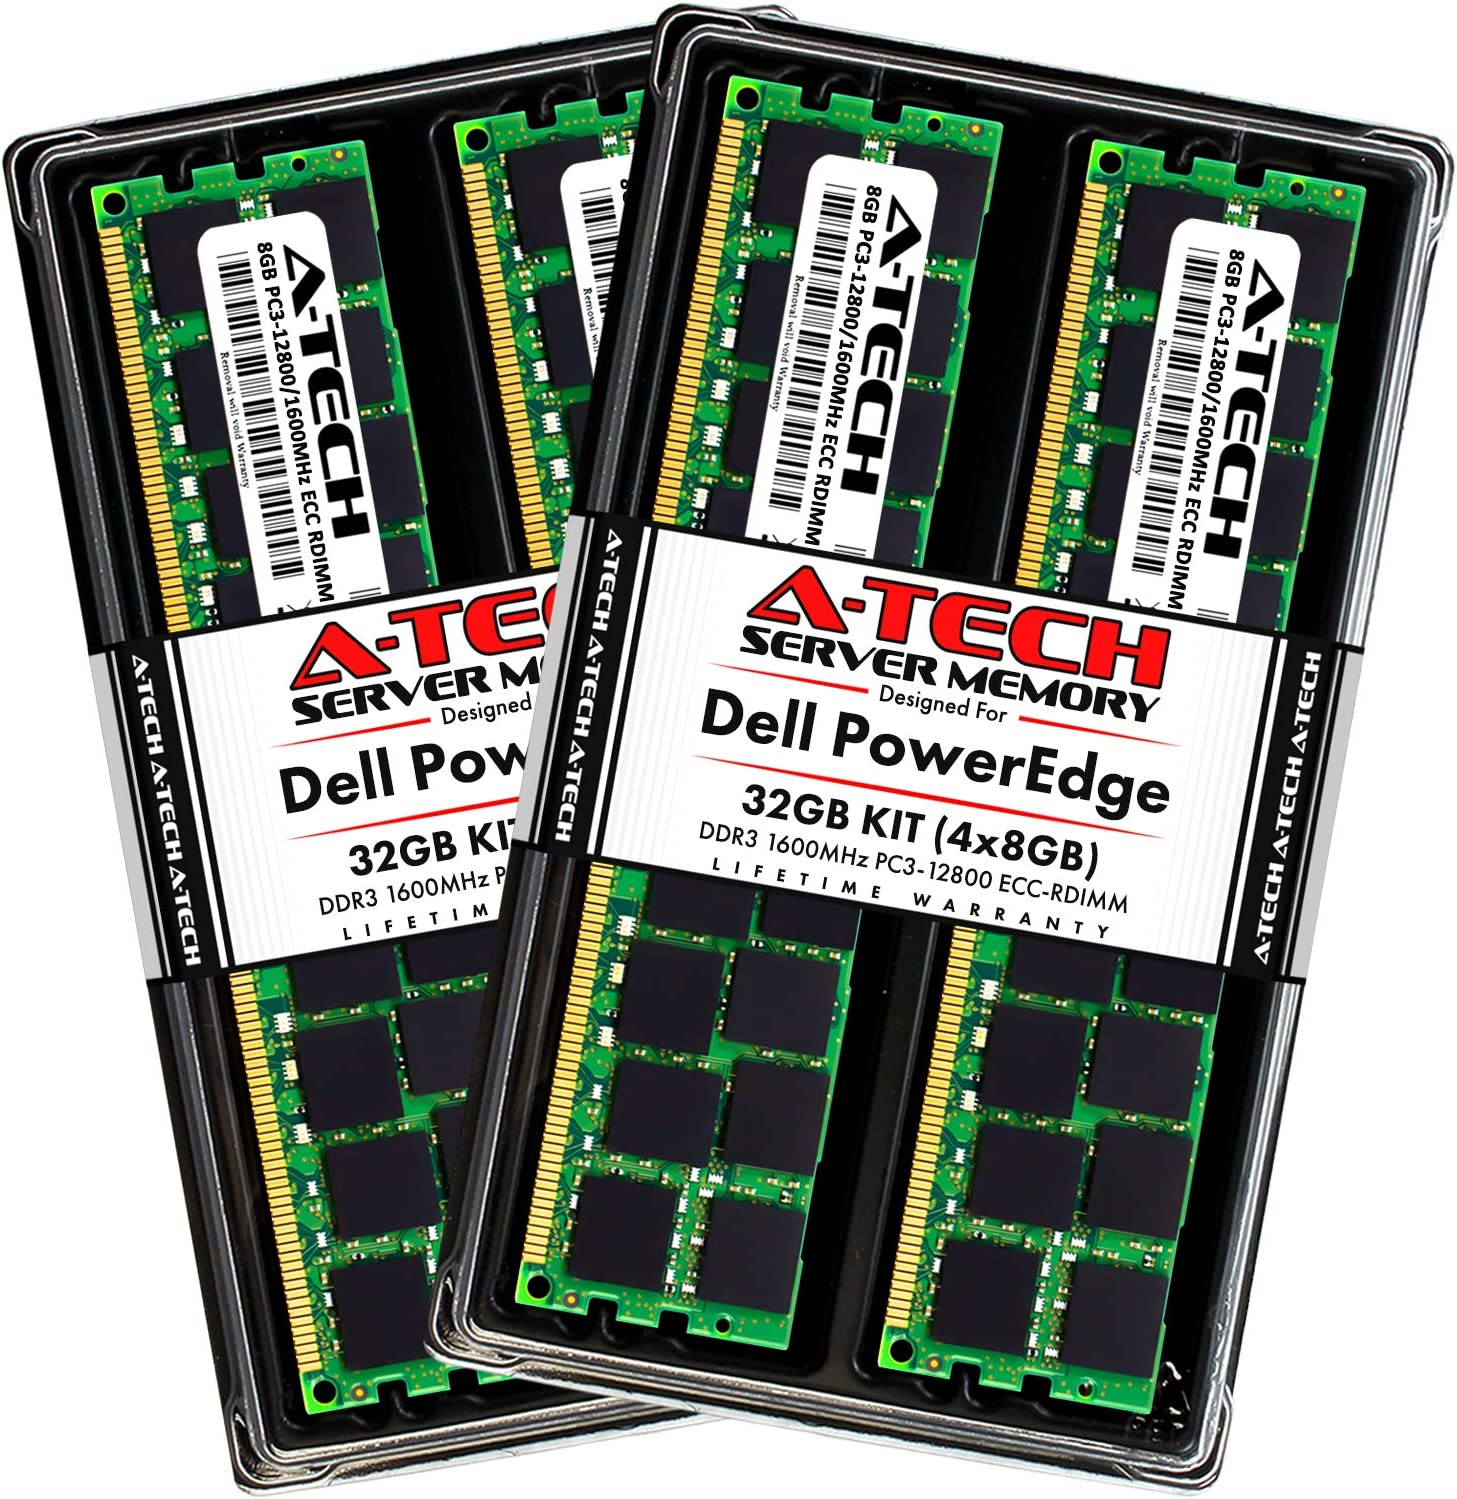 A-Tech 32GB (4x8GB) RAM for Dell PowerEdge R320, R420, R420XR, R520, R620, R720, R720XD, R820, R920 | DDR3 1600MHz ECC-RDIMM PC3-12800 2Rx4 1.5V ECC Registered DIMM Server Memory Upgrade Kit